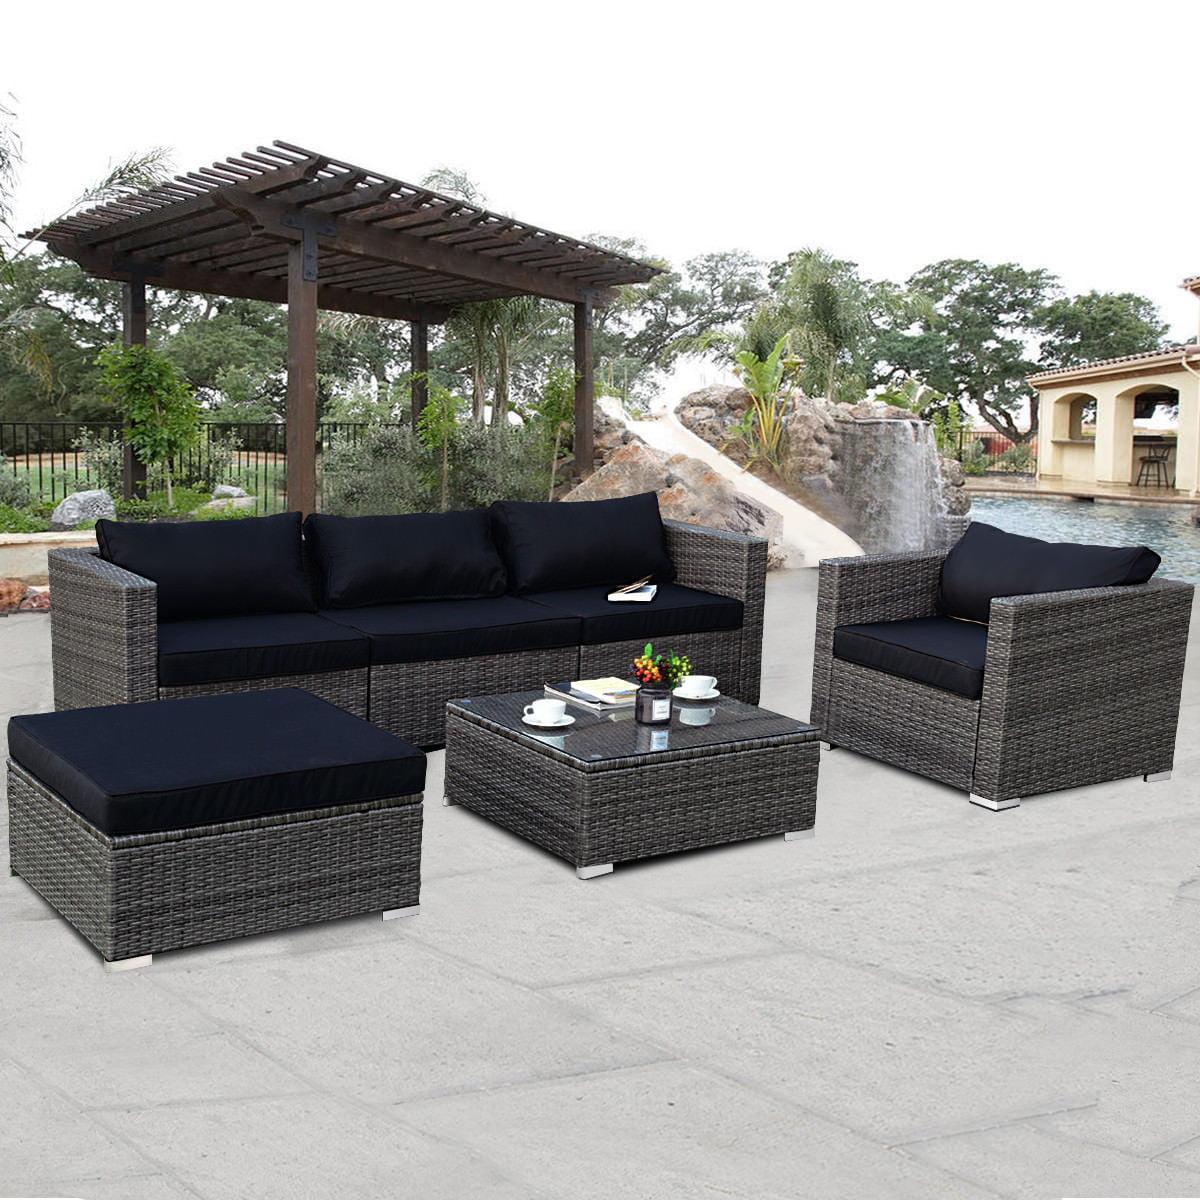 Costway 6-piece Rattan Wicker Patio Furniture Set Sectional Sofa Couch Yard W/Black Cushion